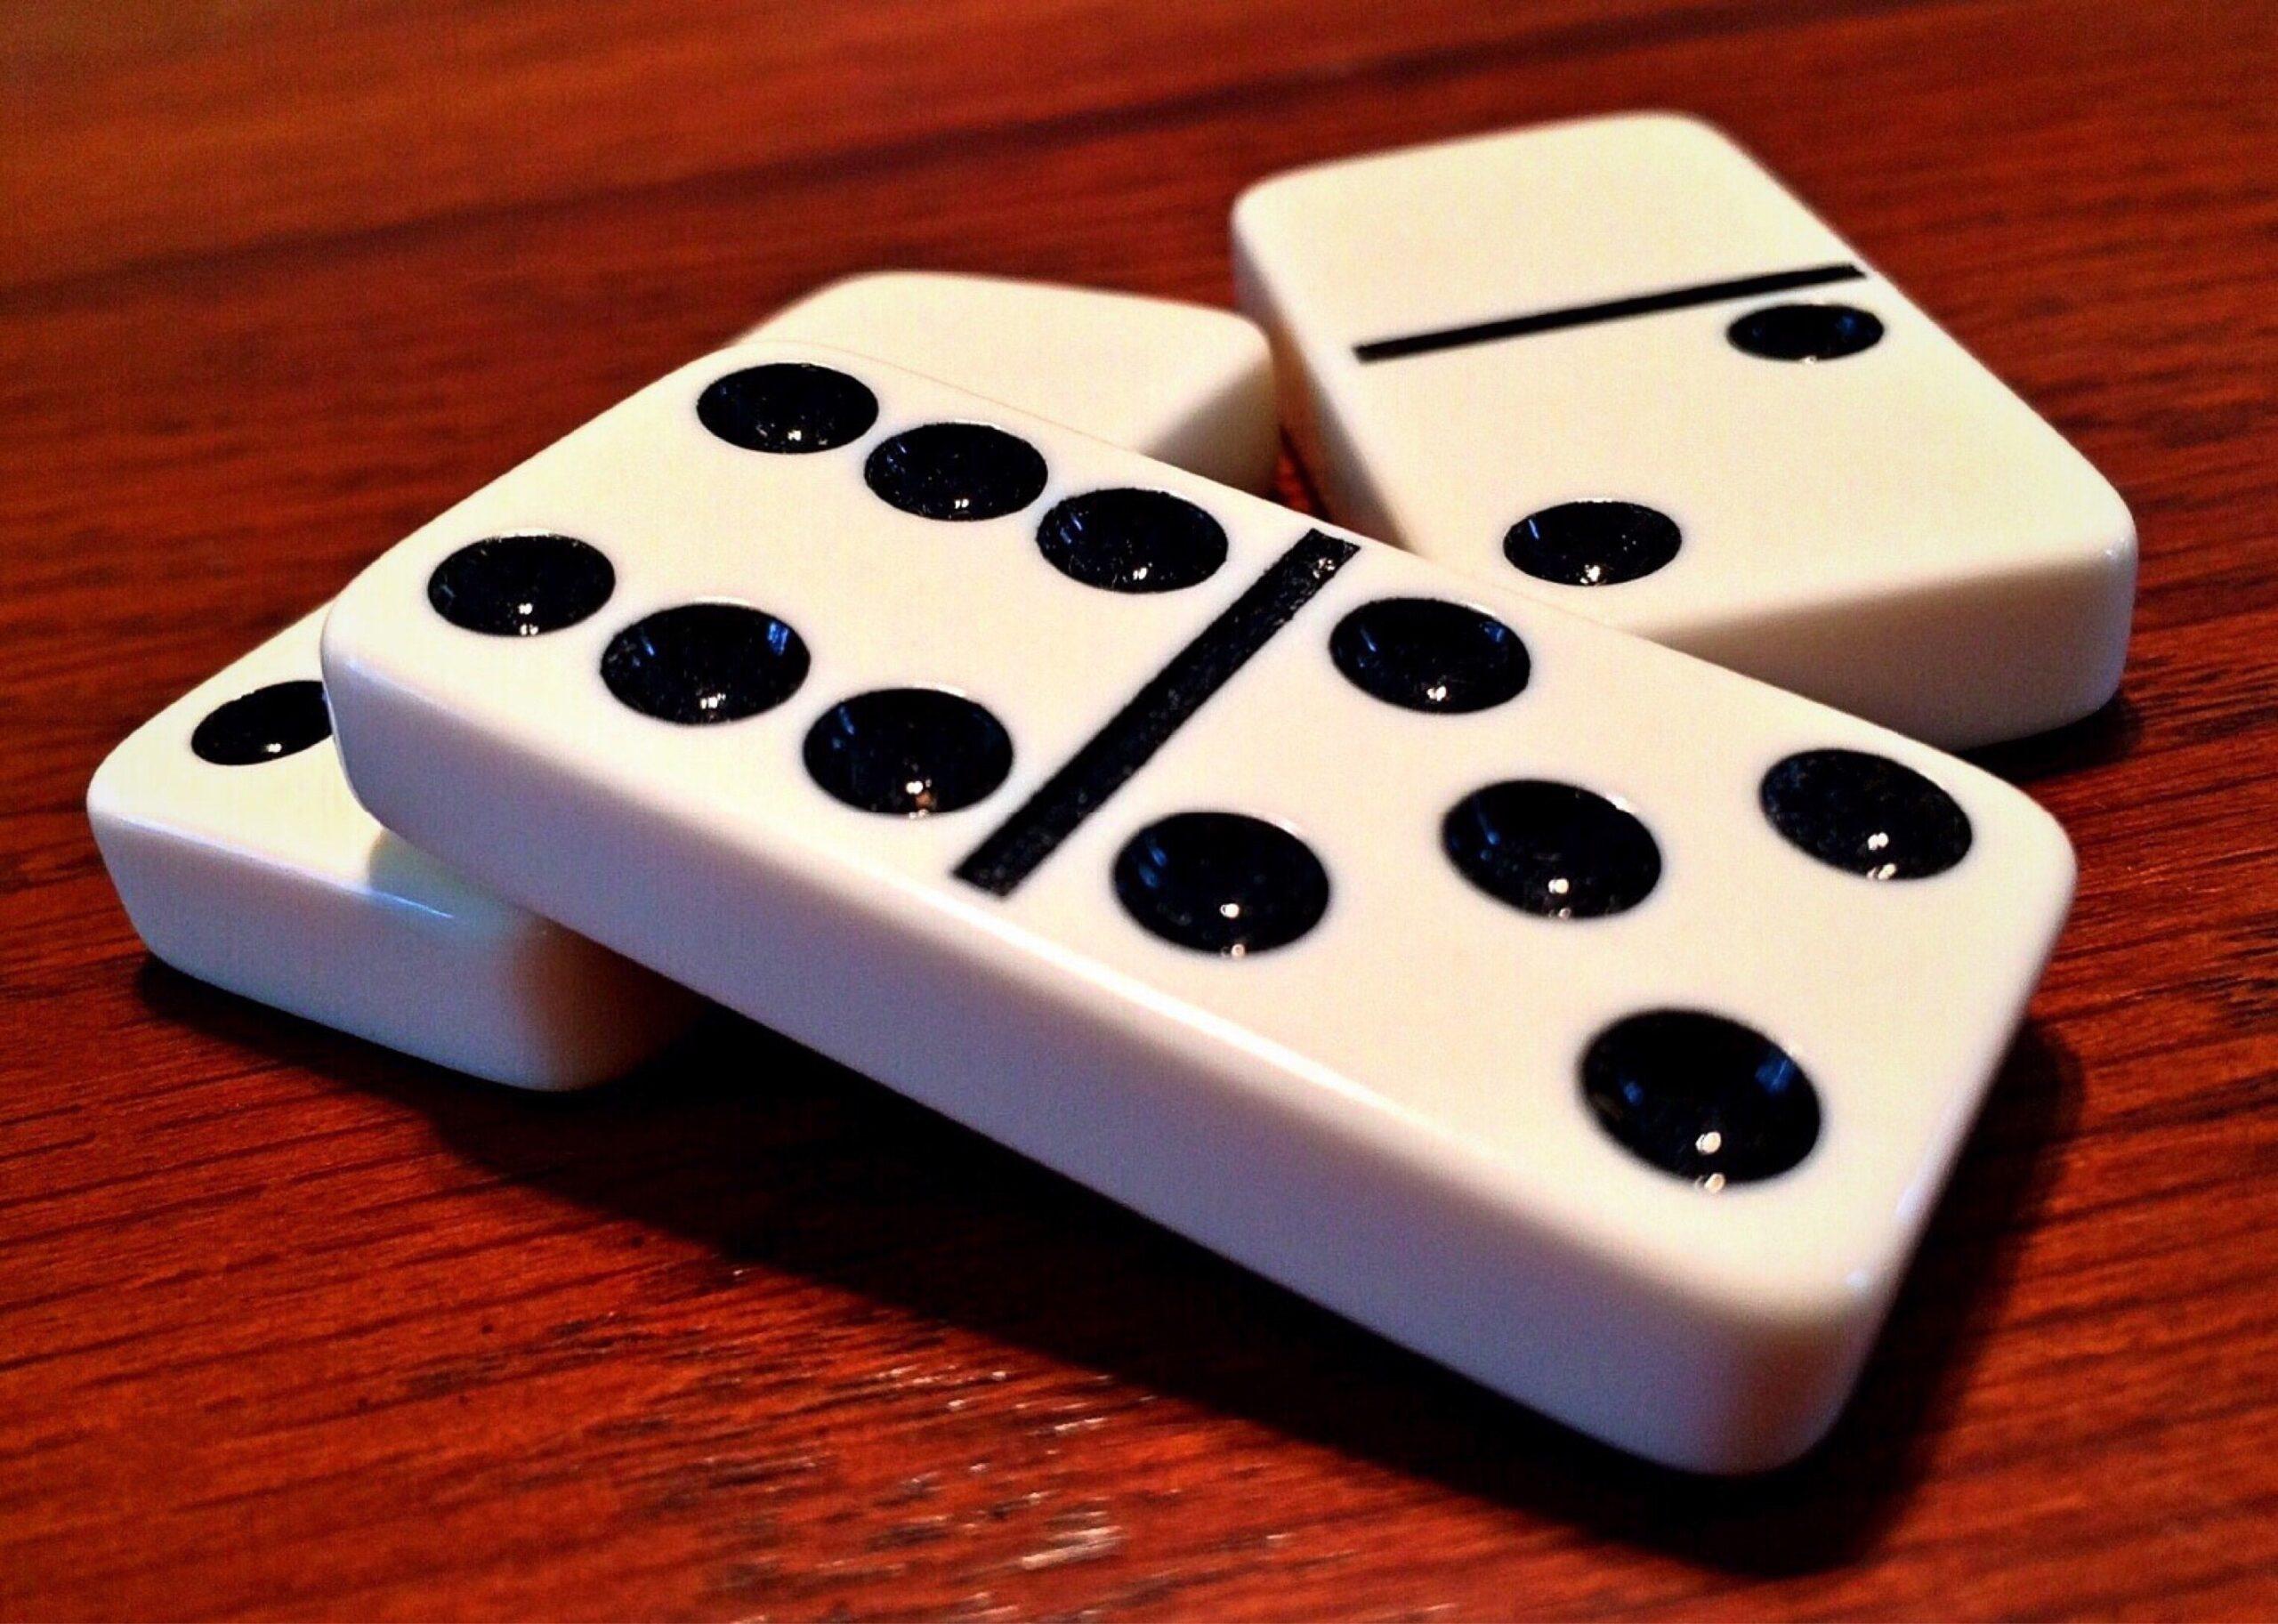 Jelajahi Permainan Domino Dan Menangkan Hadiah Menarik